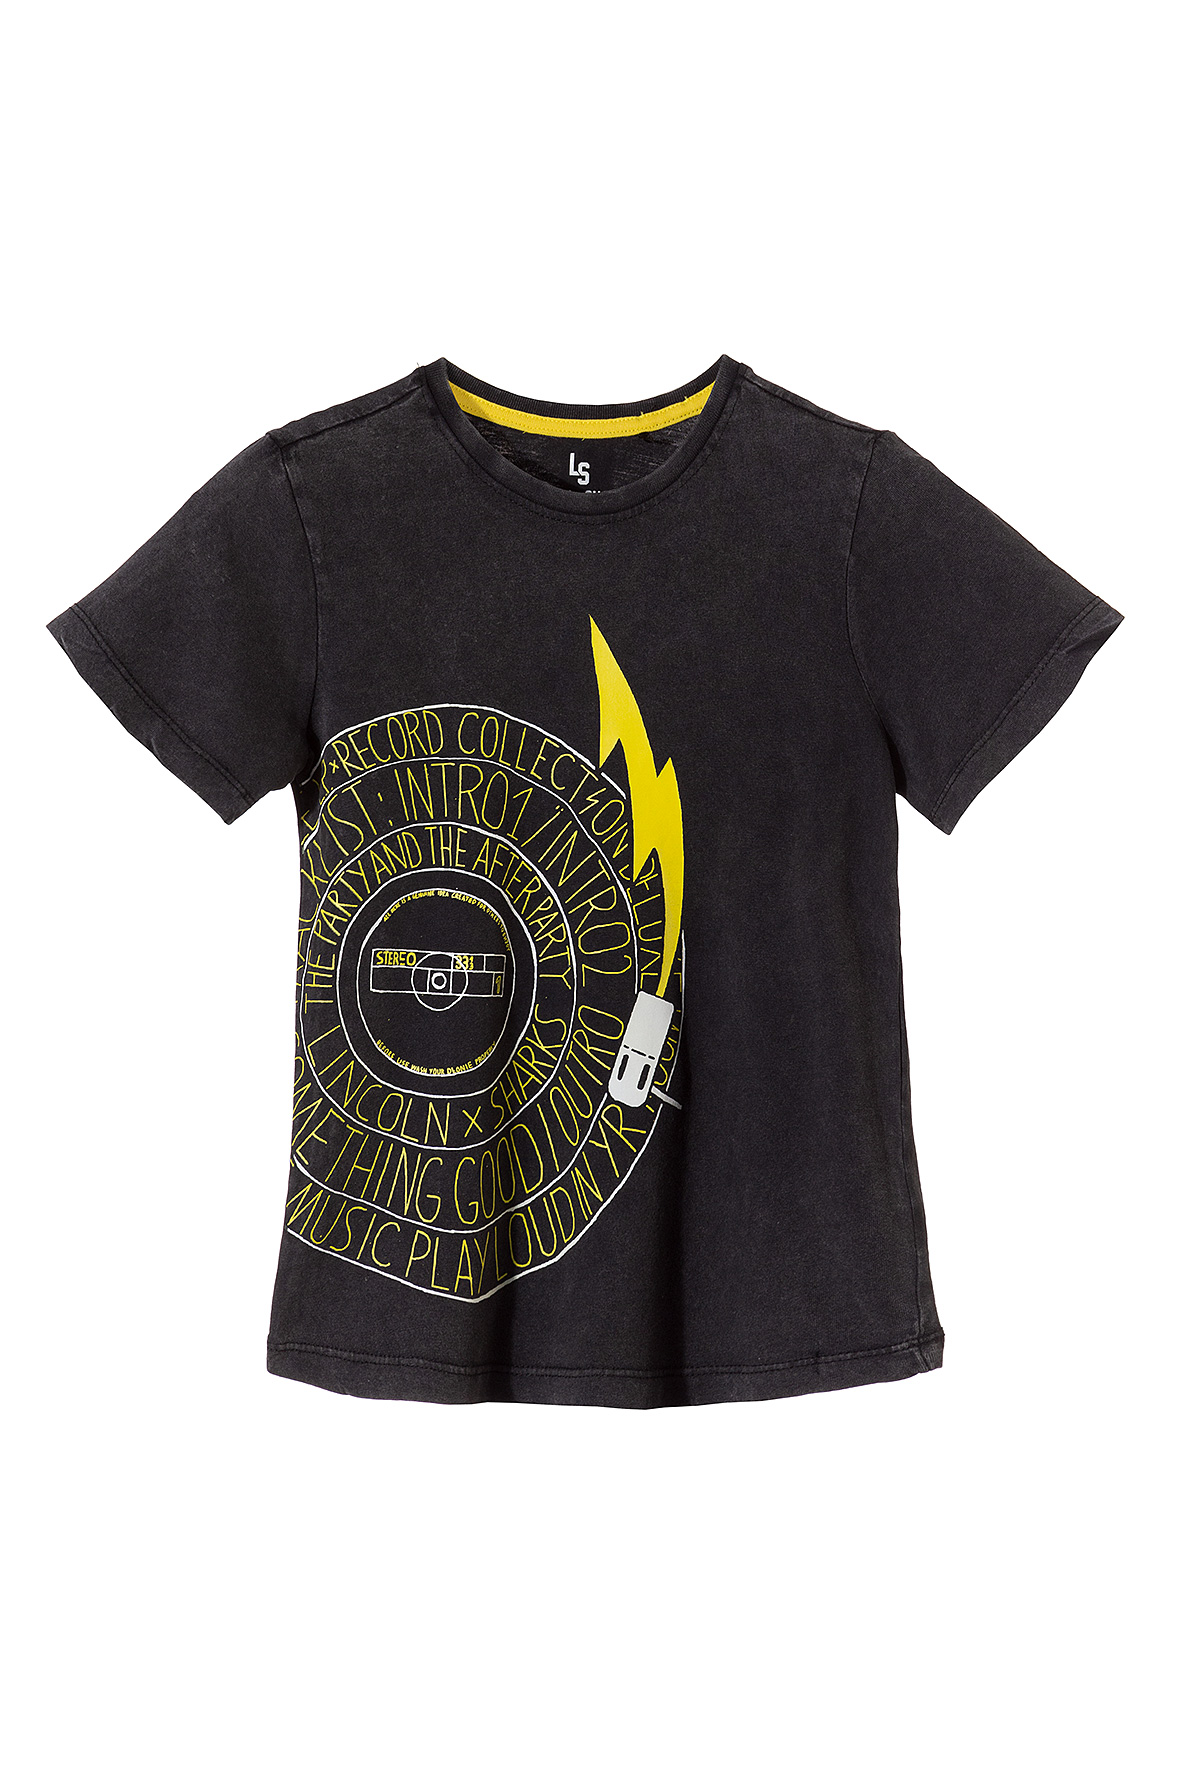 T-shirt dla chłopca 2I3505